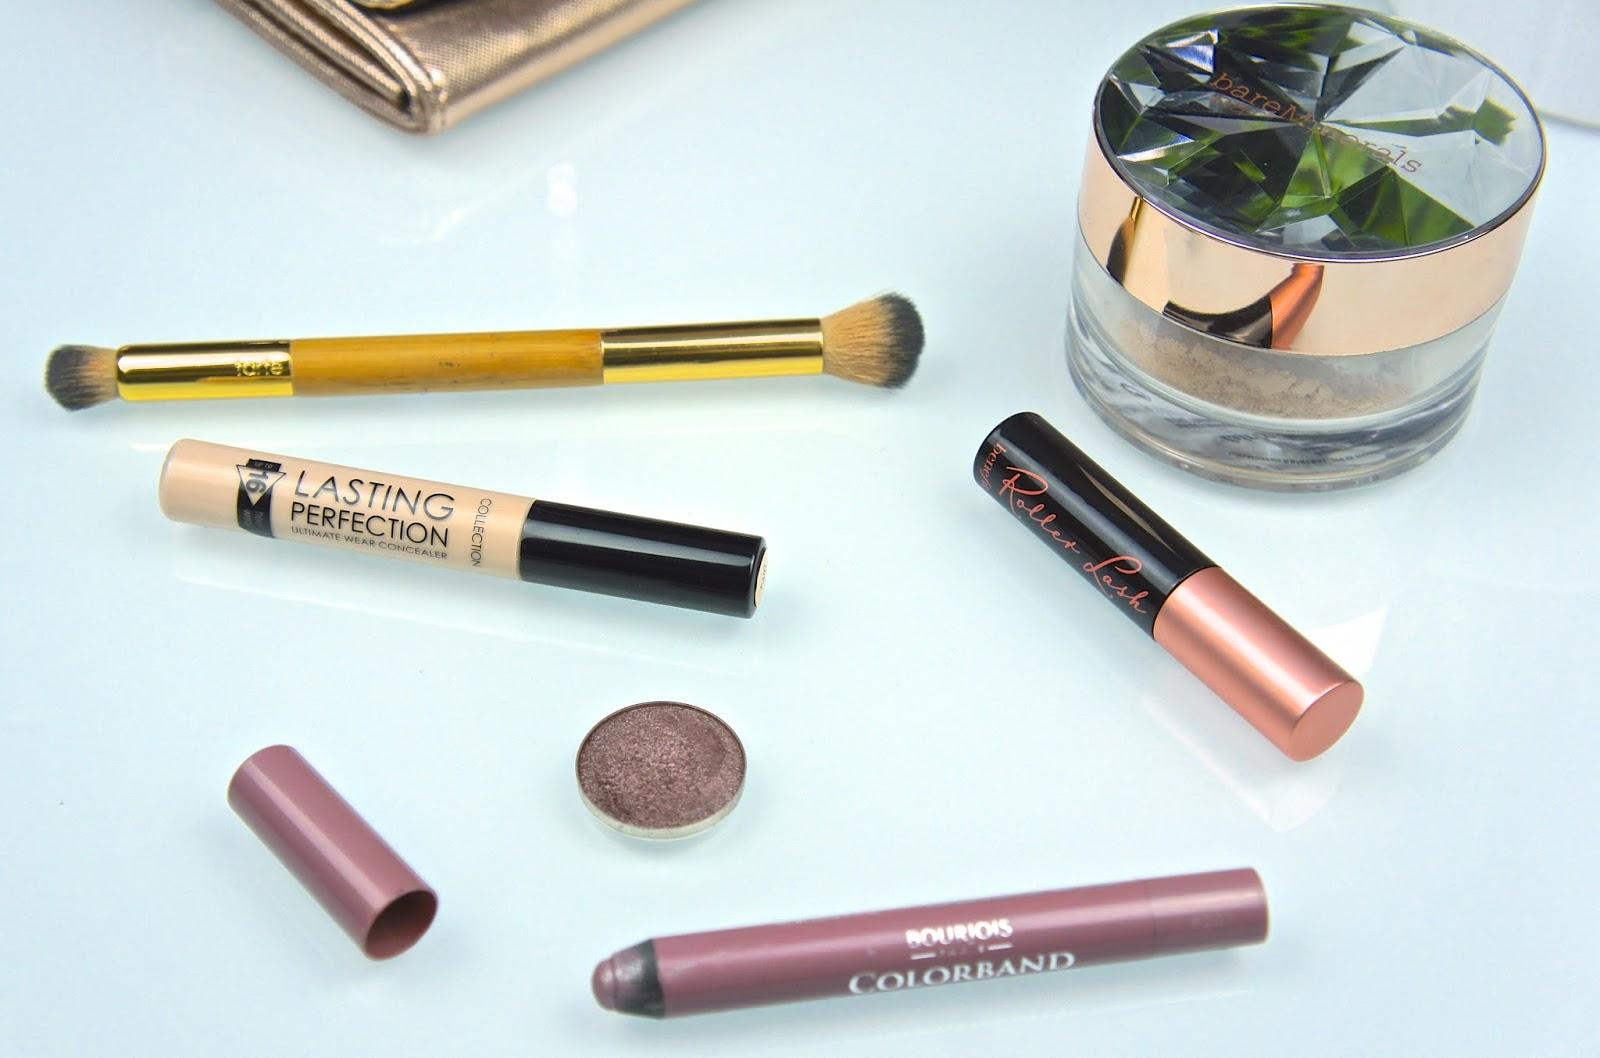 Bare,Minerals,bourjois,Collection,Tarte,Benefit,Rollerlash,colorband